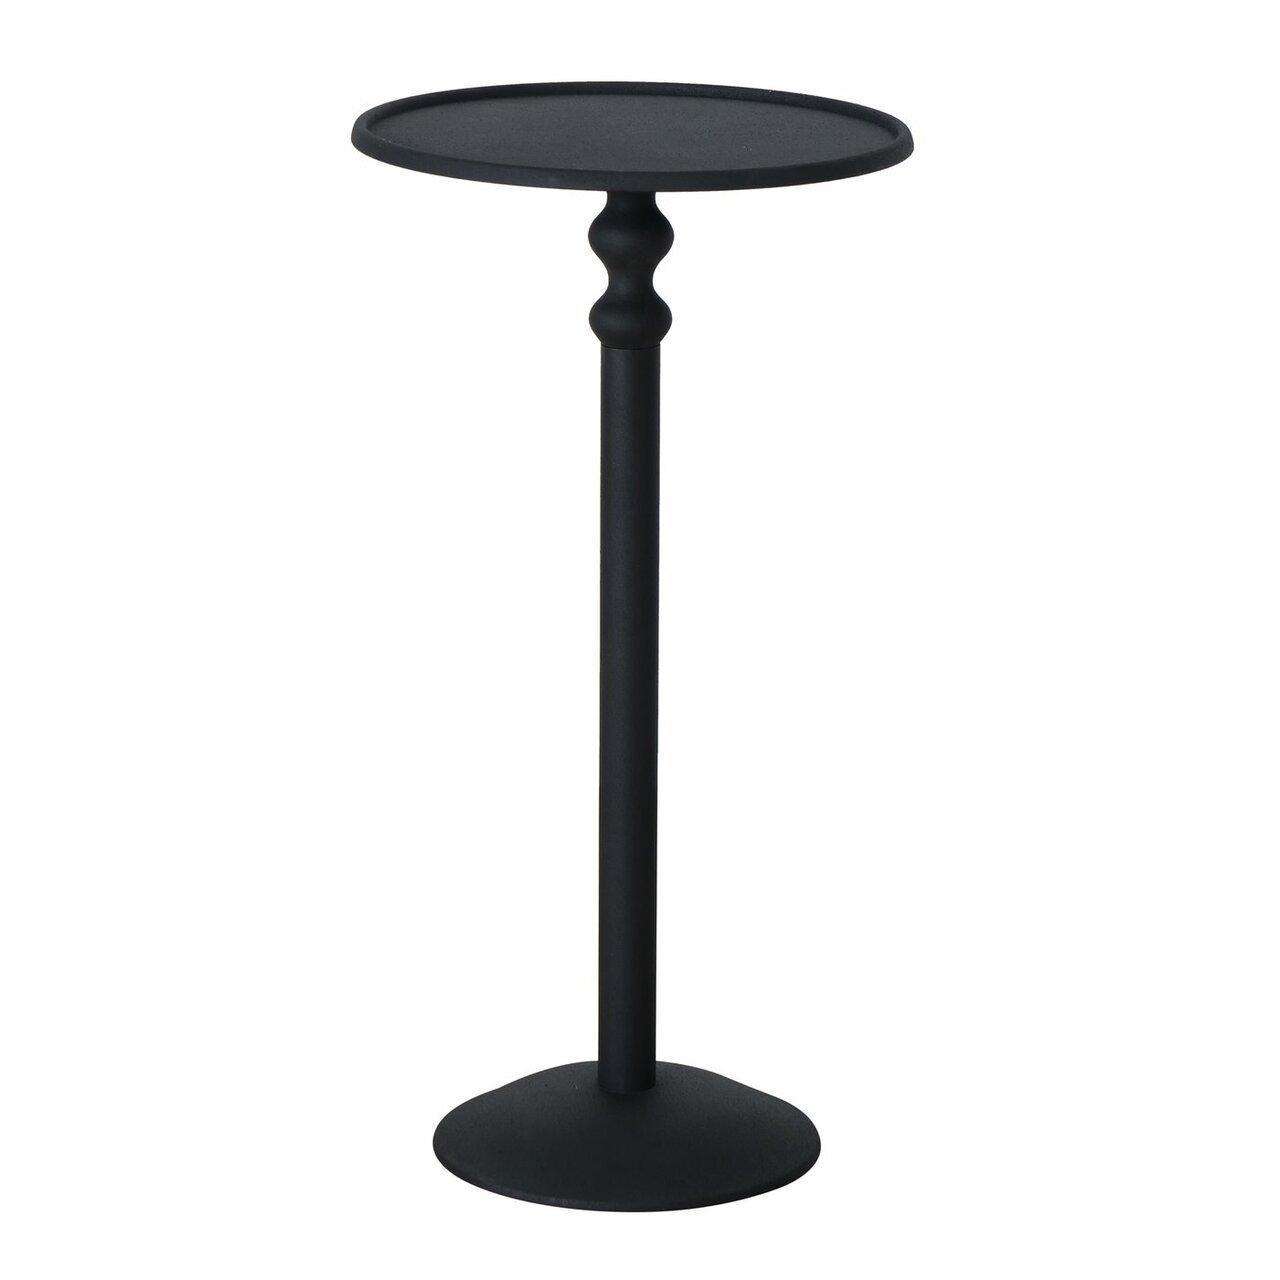 Boltze Tisch Beistelltisch Normes